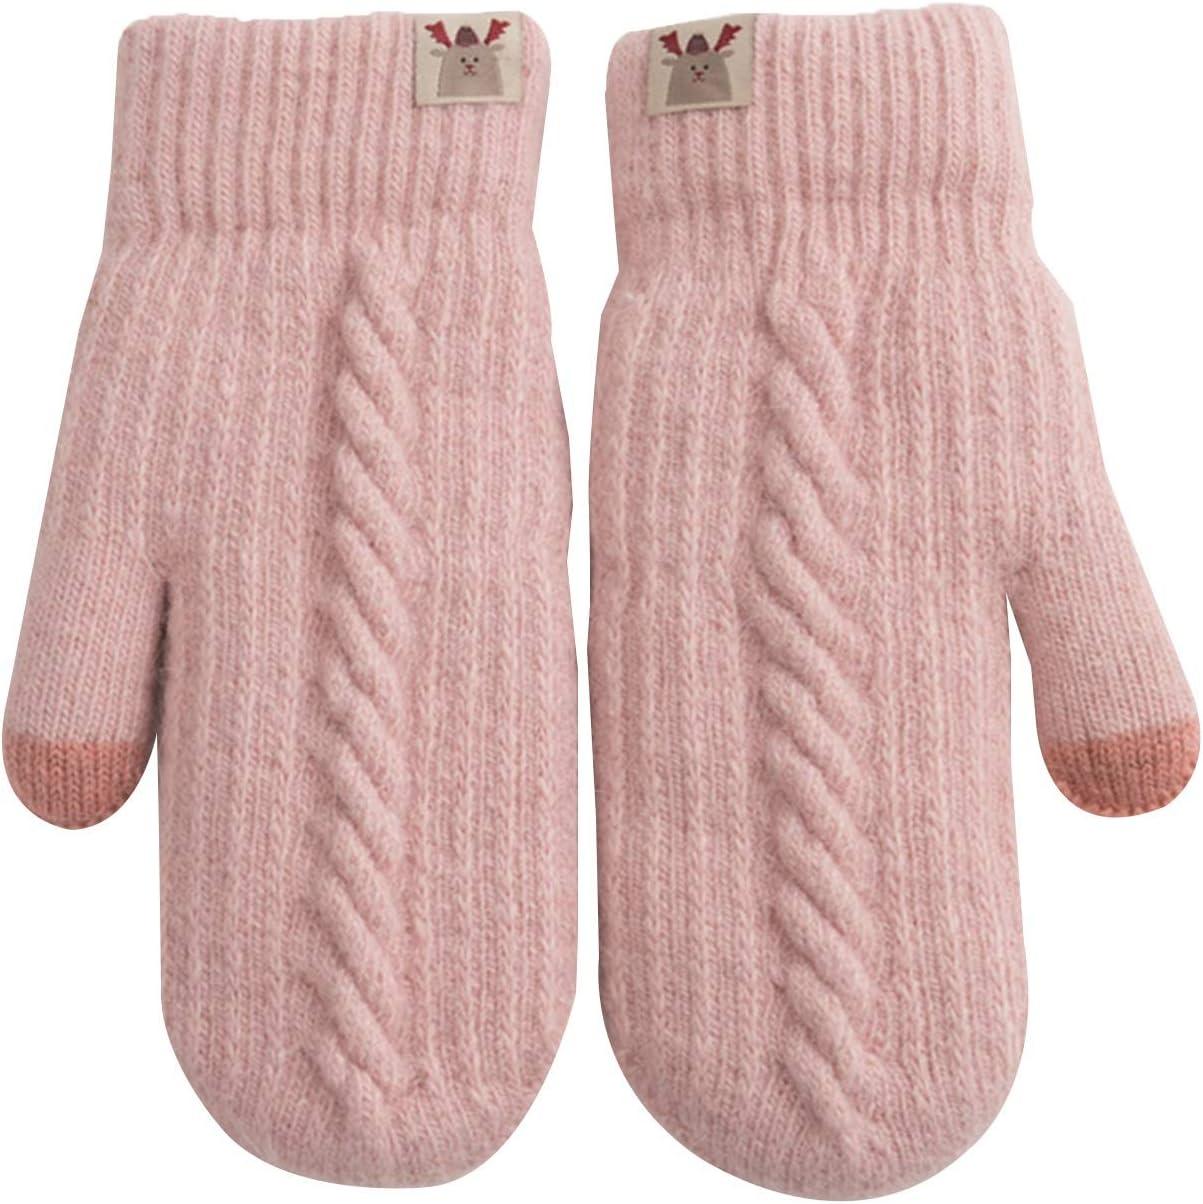 Gloves Gloves Women Winter Plus Velvet Ligature Thickened Warmth Hanging Neck Cashmere Gloves (Color : Pink)